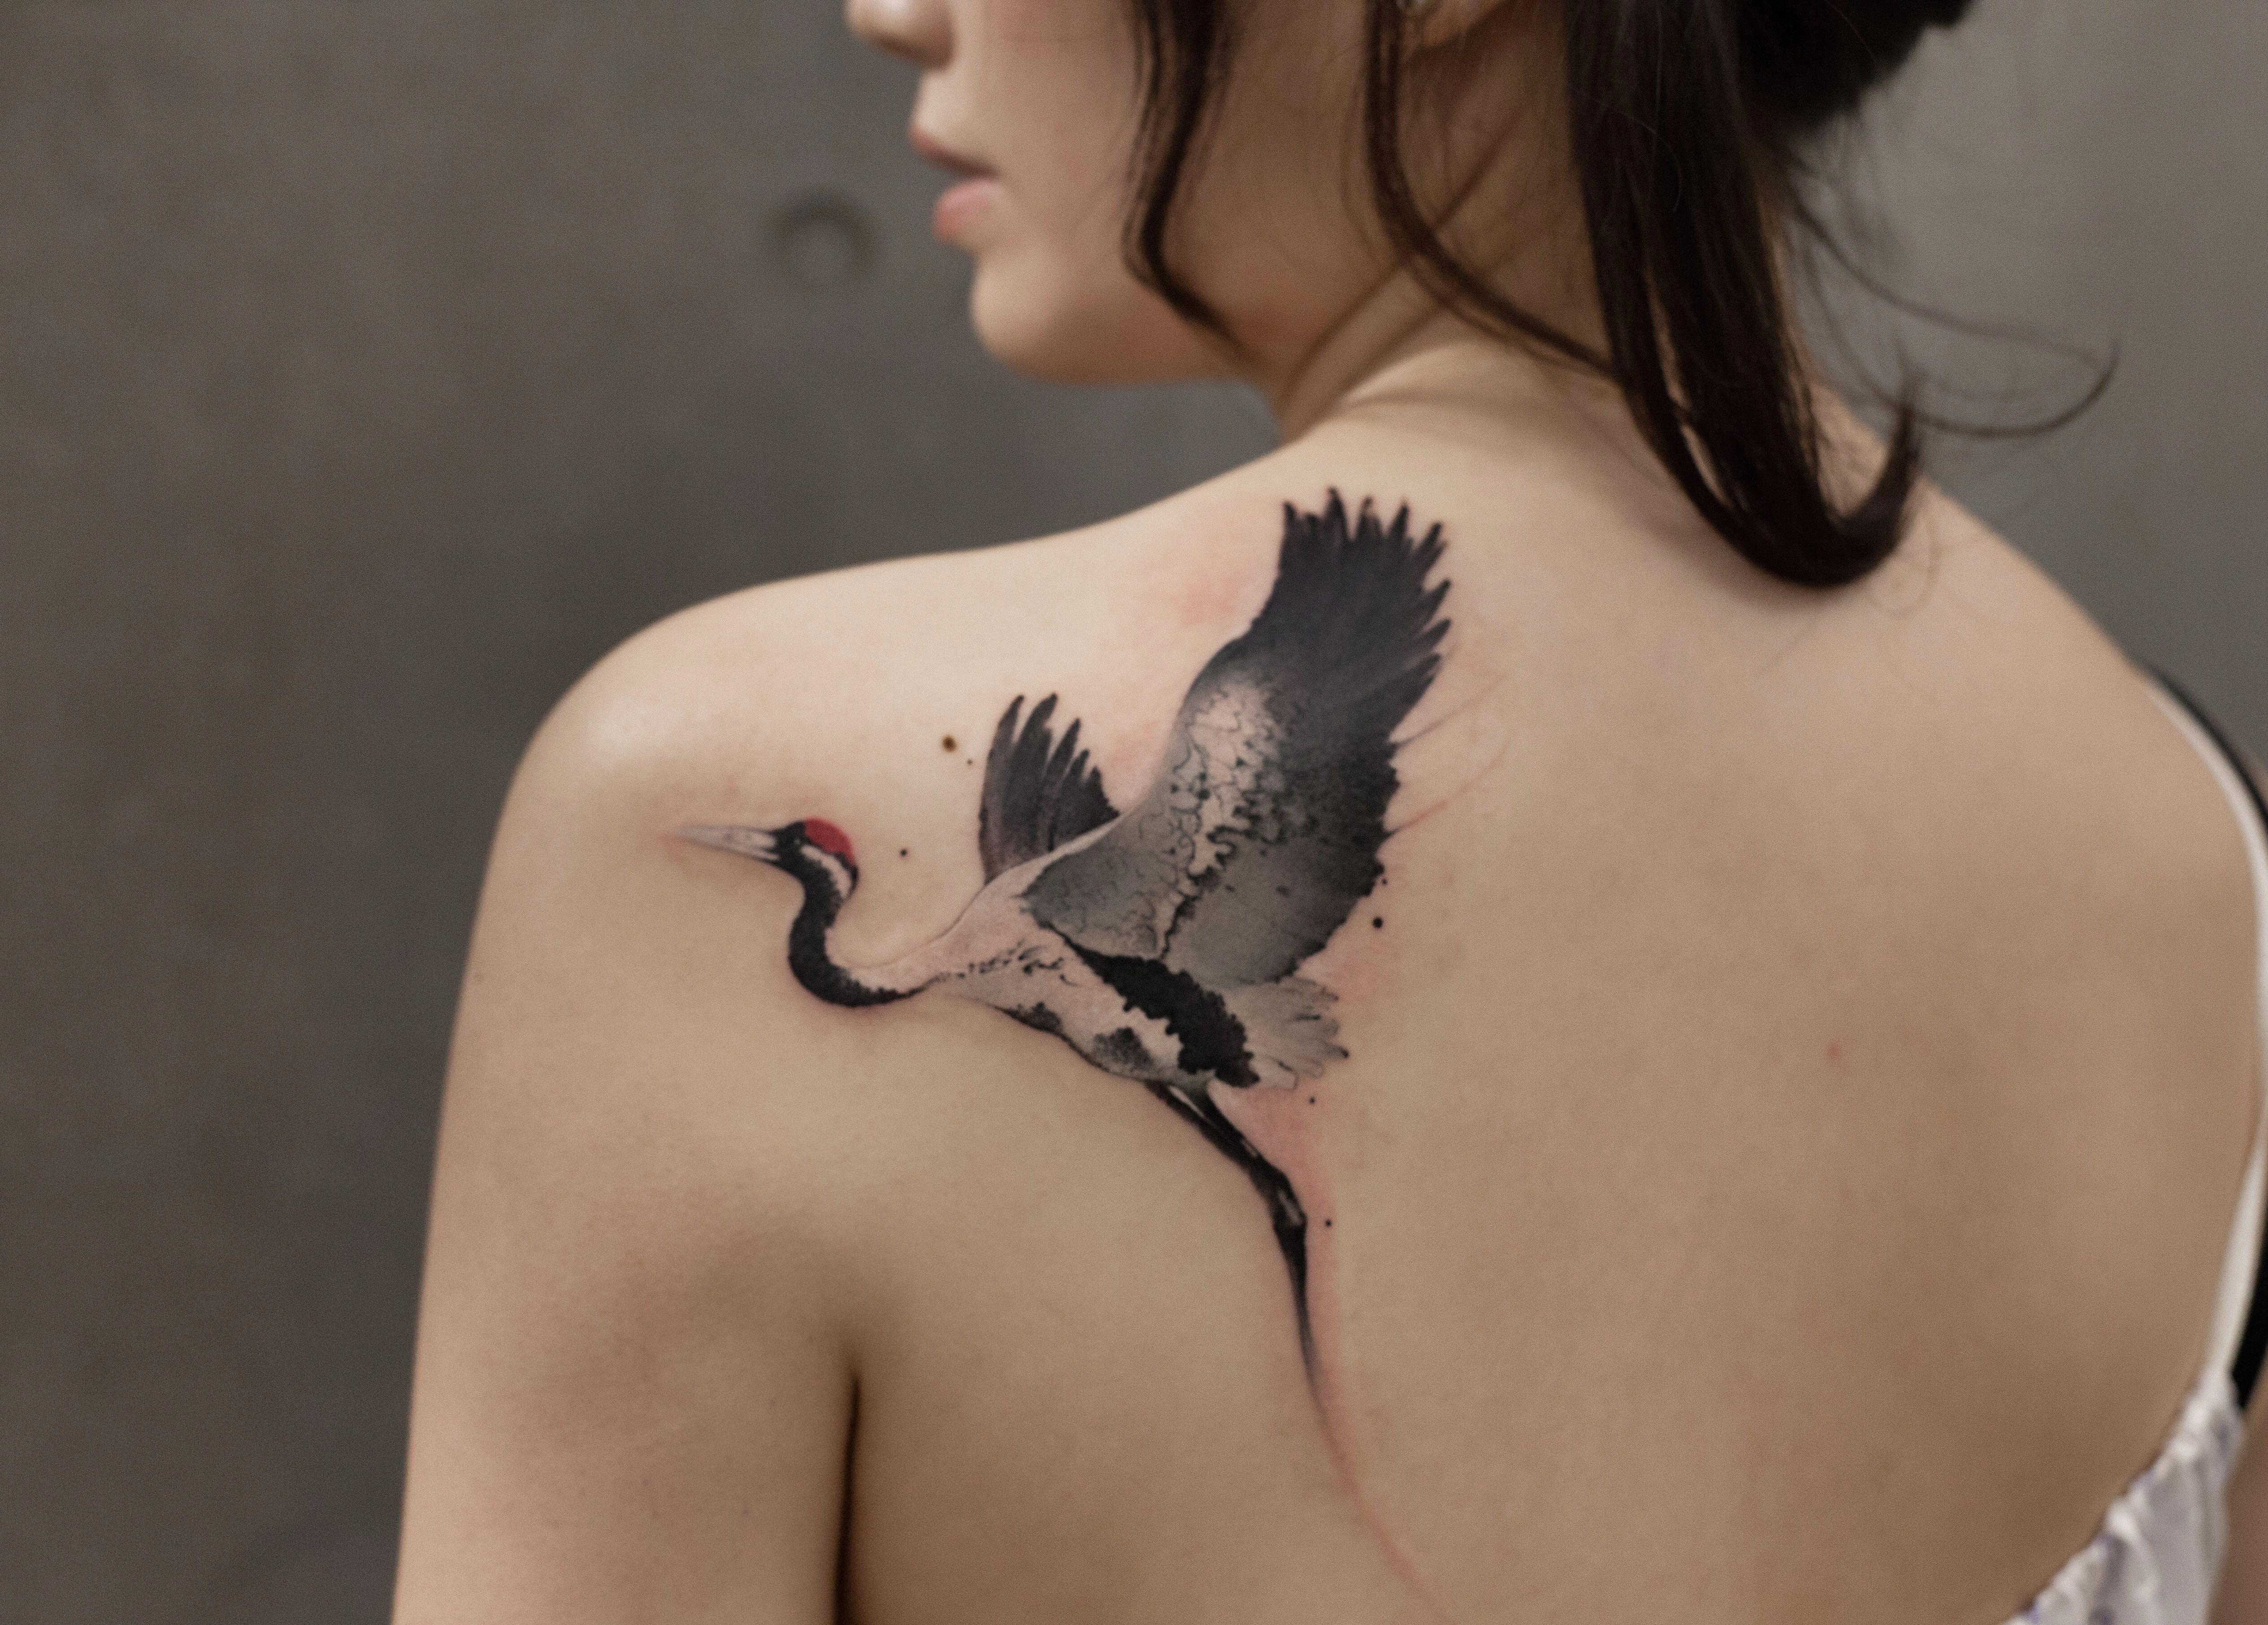 Tattoos In Japanese Prints Japanesetattoos Crane Tattoo Tattoo Styles Japanese Tattoo Symbols